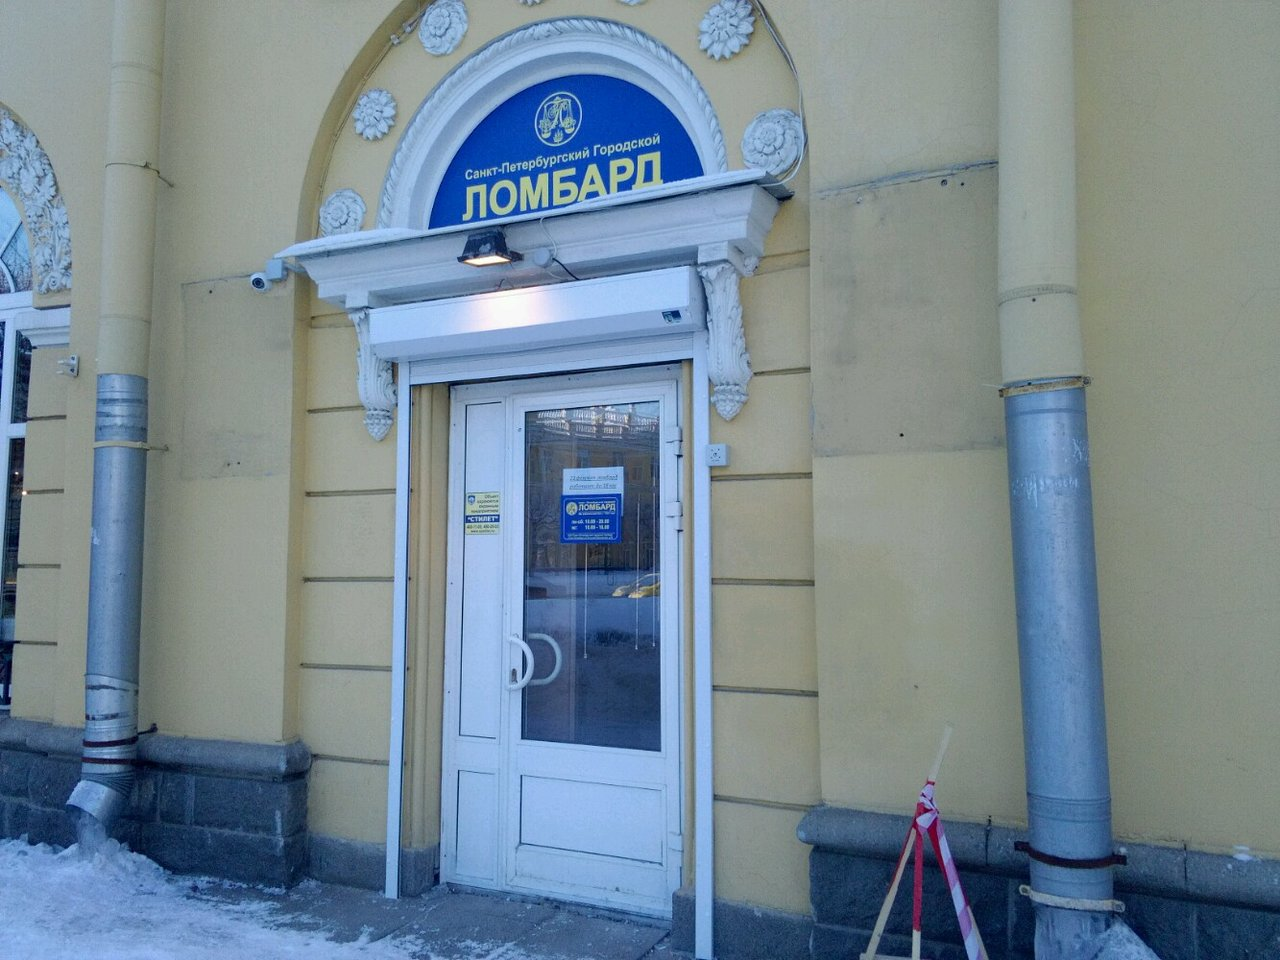 Часы бульвар пушкин ломбард работы октябрьский продать часы форум